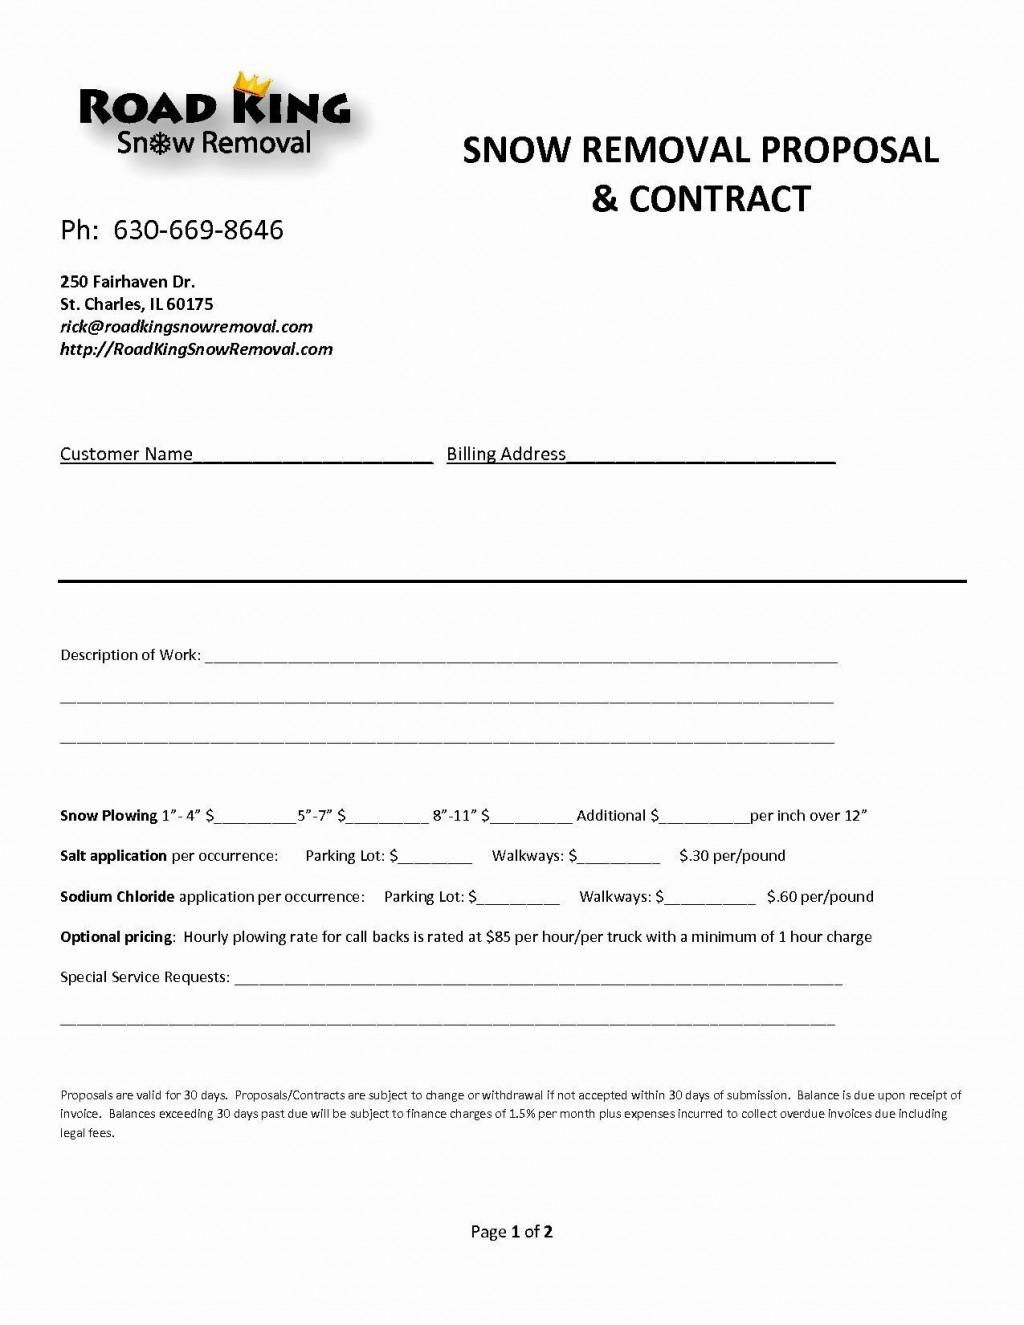 000 Singular Snow Removal Contract Template Sample  Templates Free Printable Simple Seasonal Plow AgreementLarge